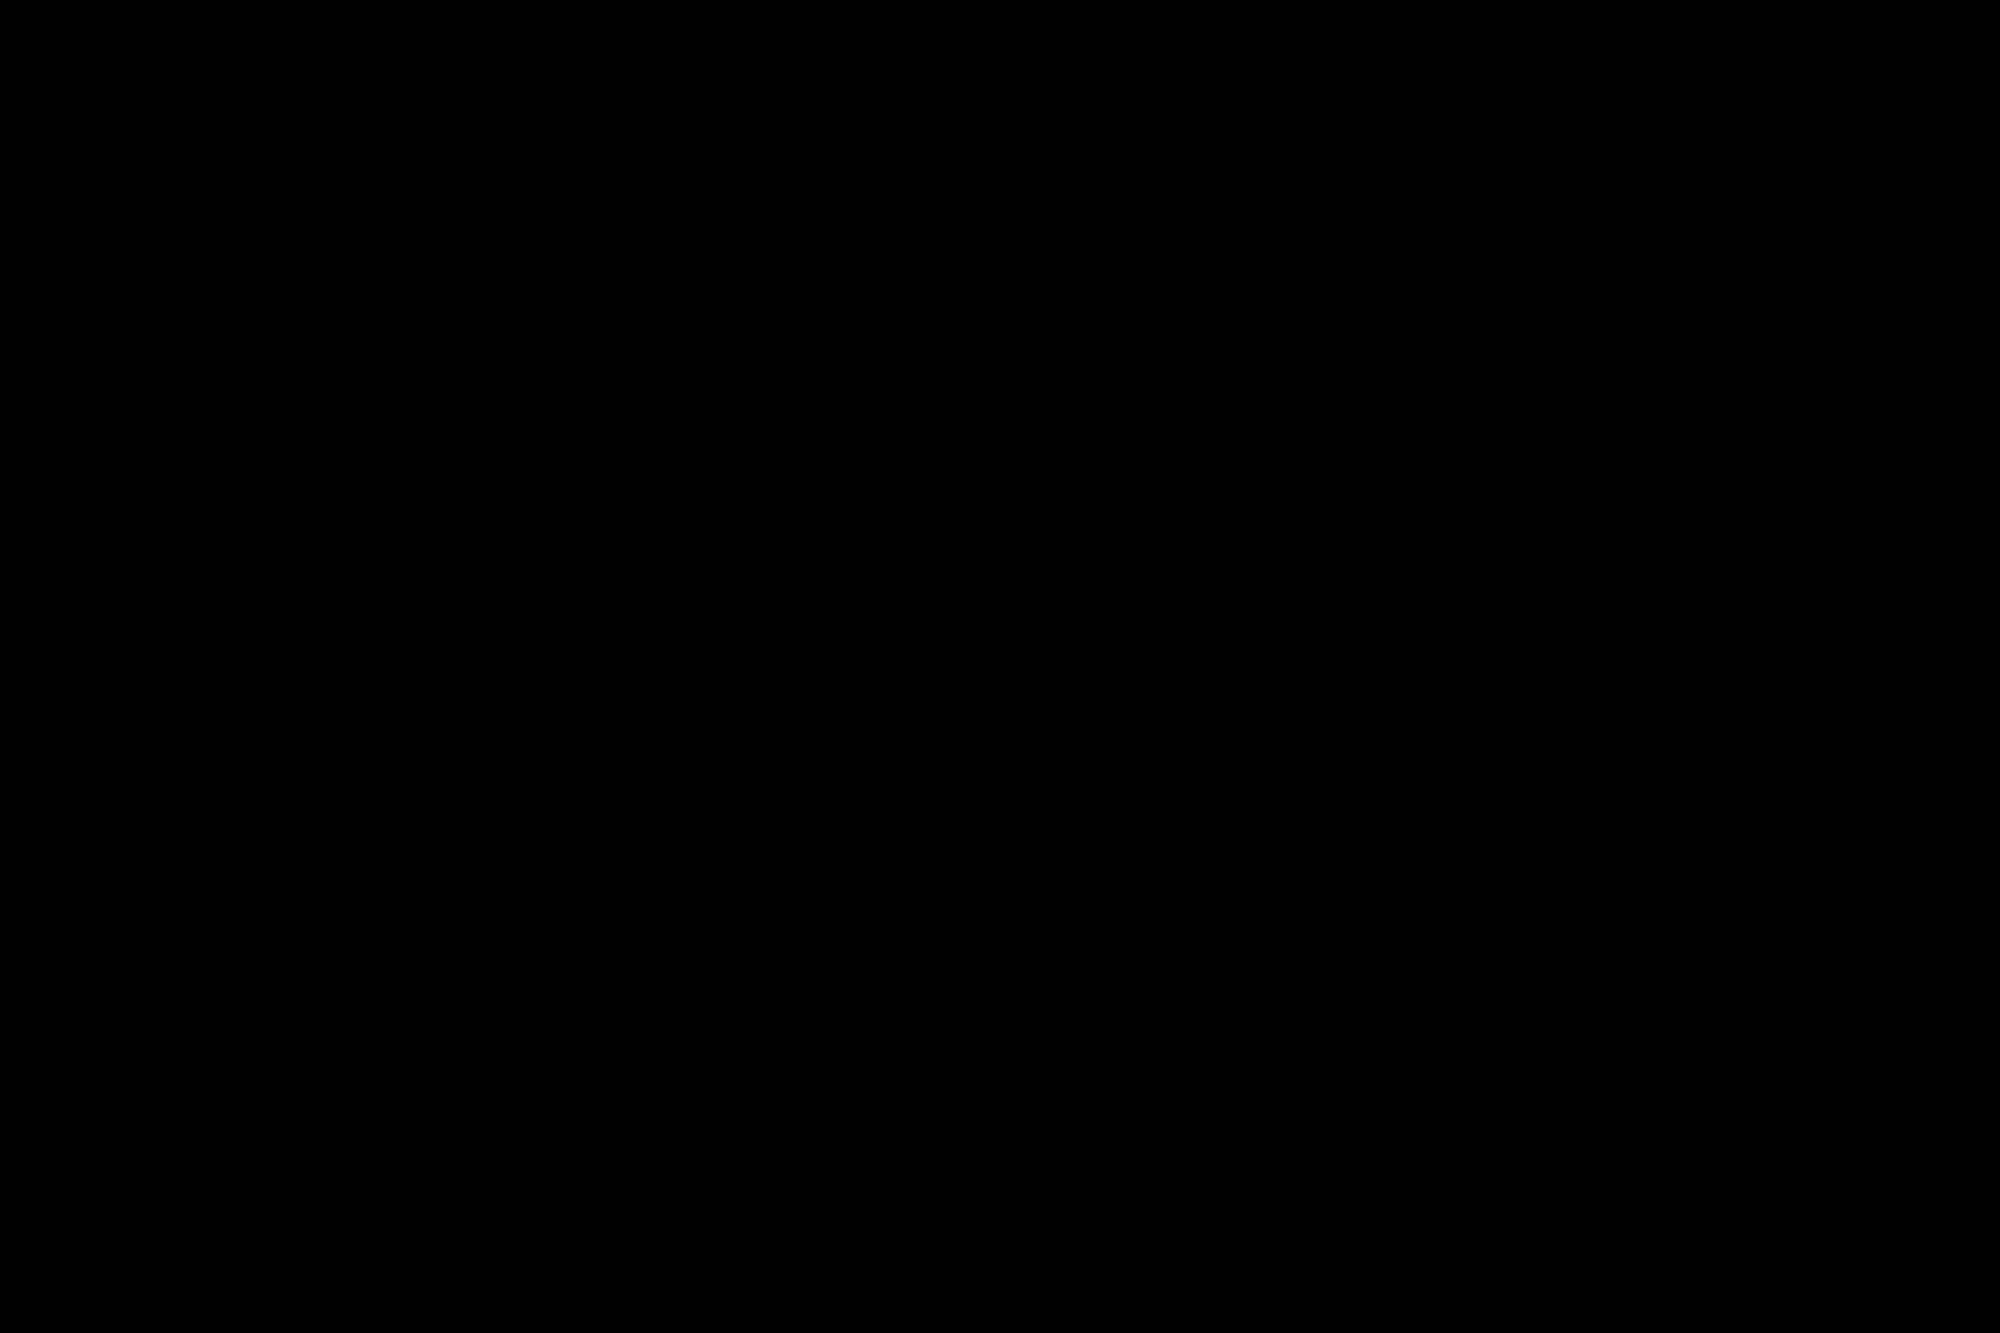 black-color21.png